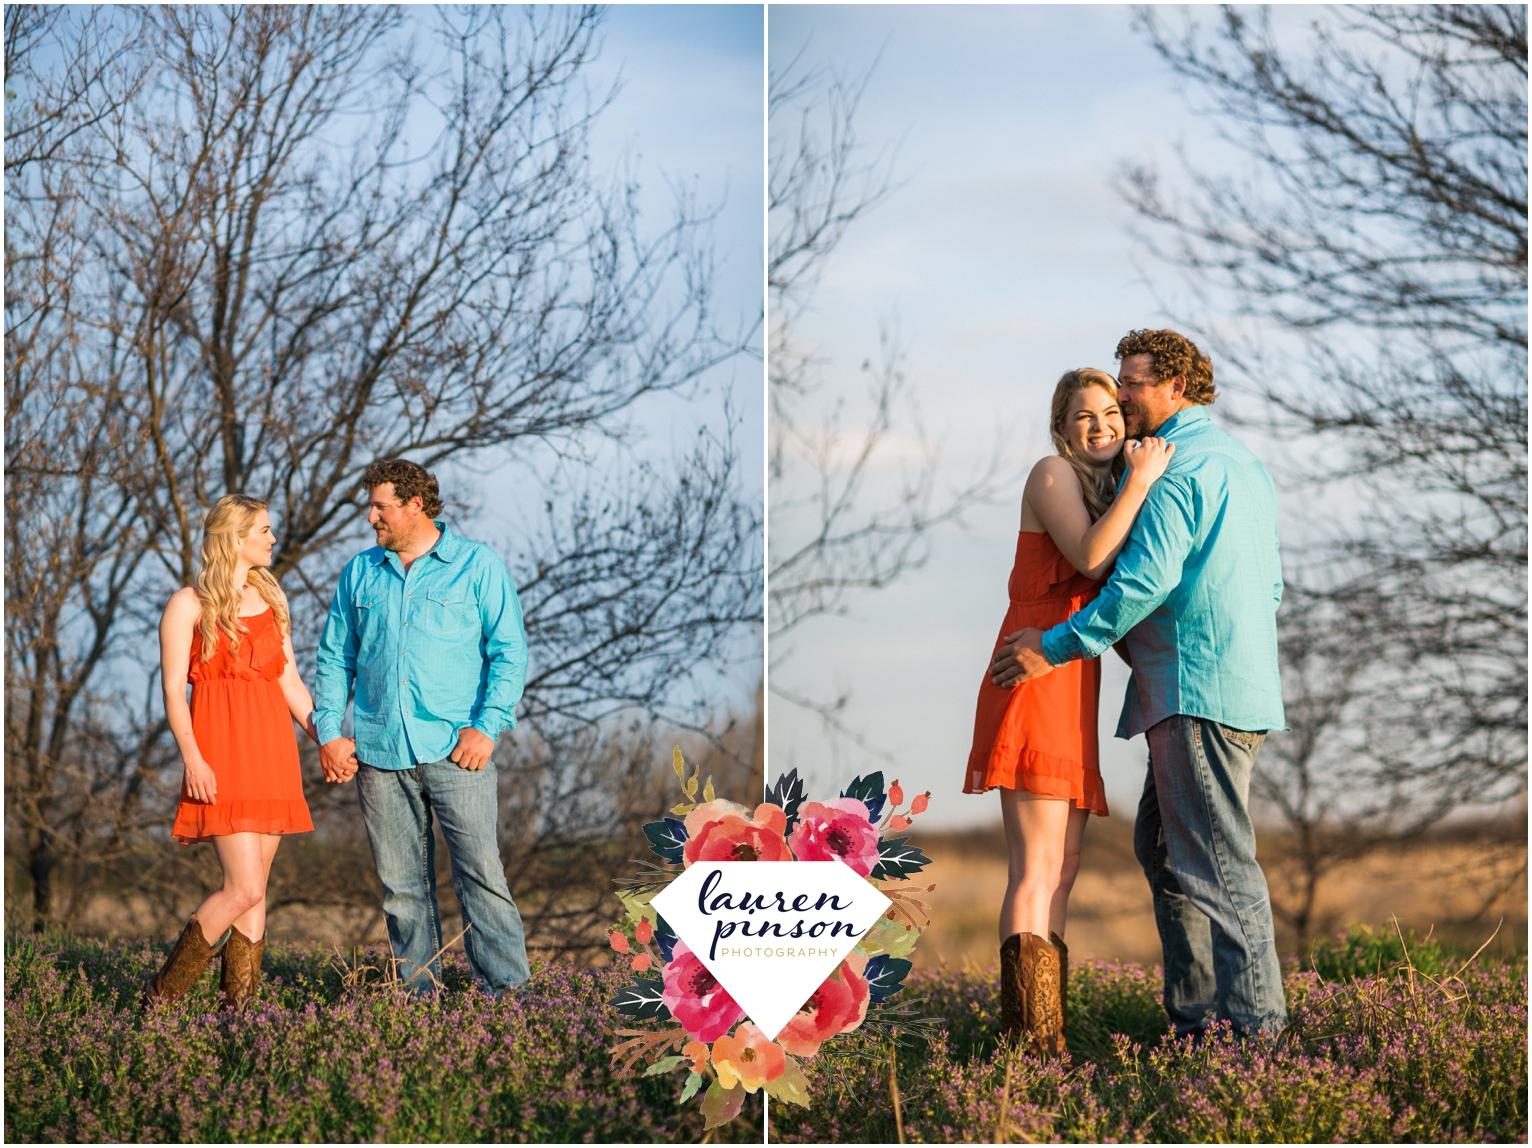 wichita-falls-wedding-photographer-engagement-session-texas-photography-oklahoma-engagement-wedding-photography_0632.jpg